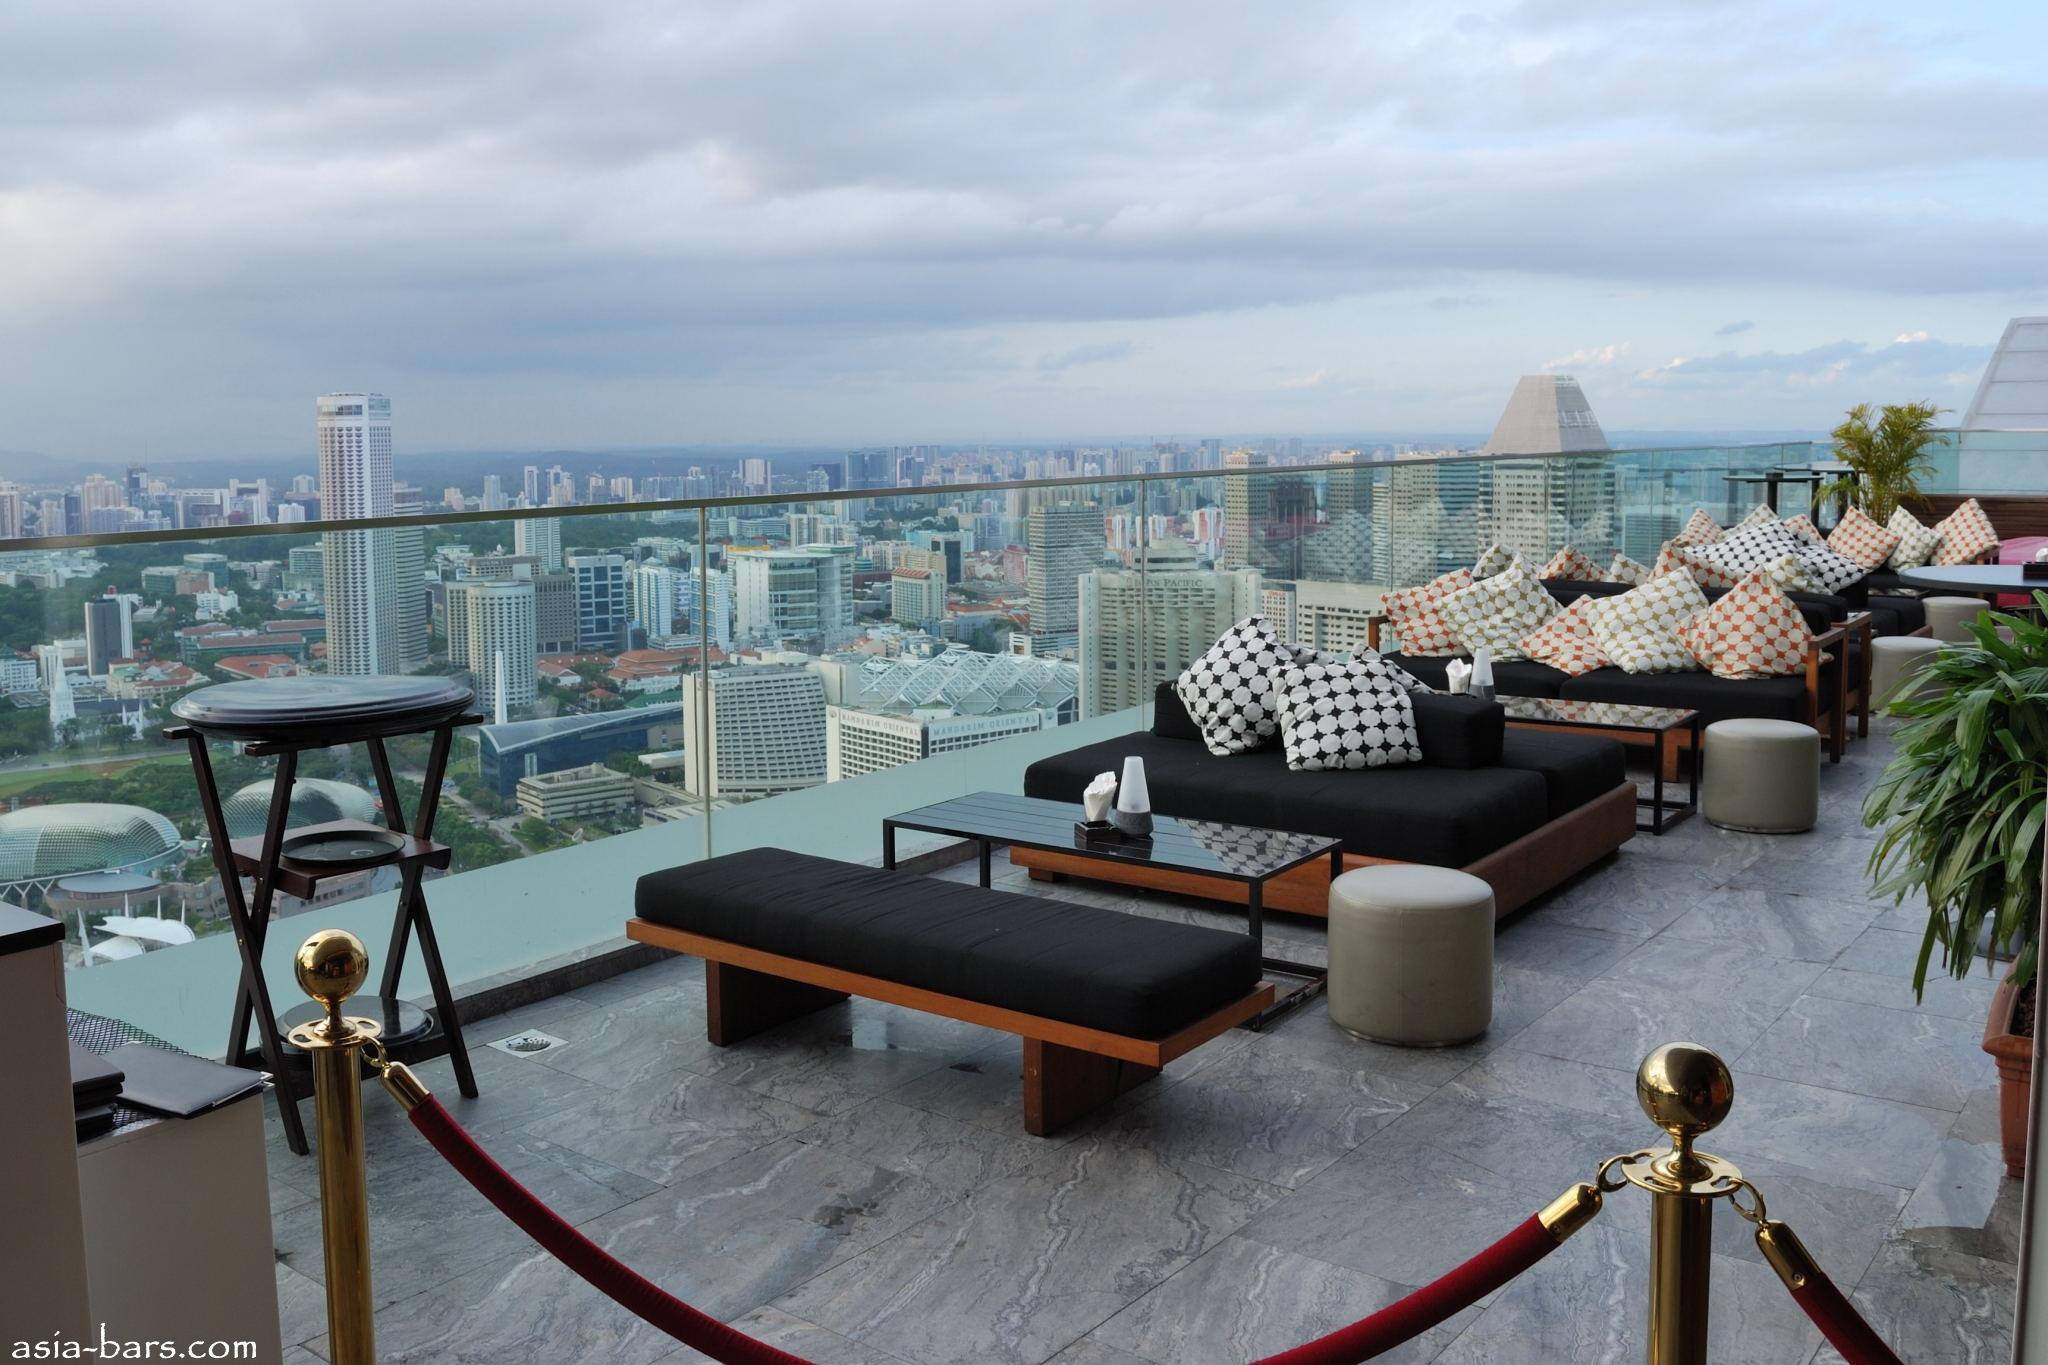 Marina Bay Sands Restaurants And Bars